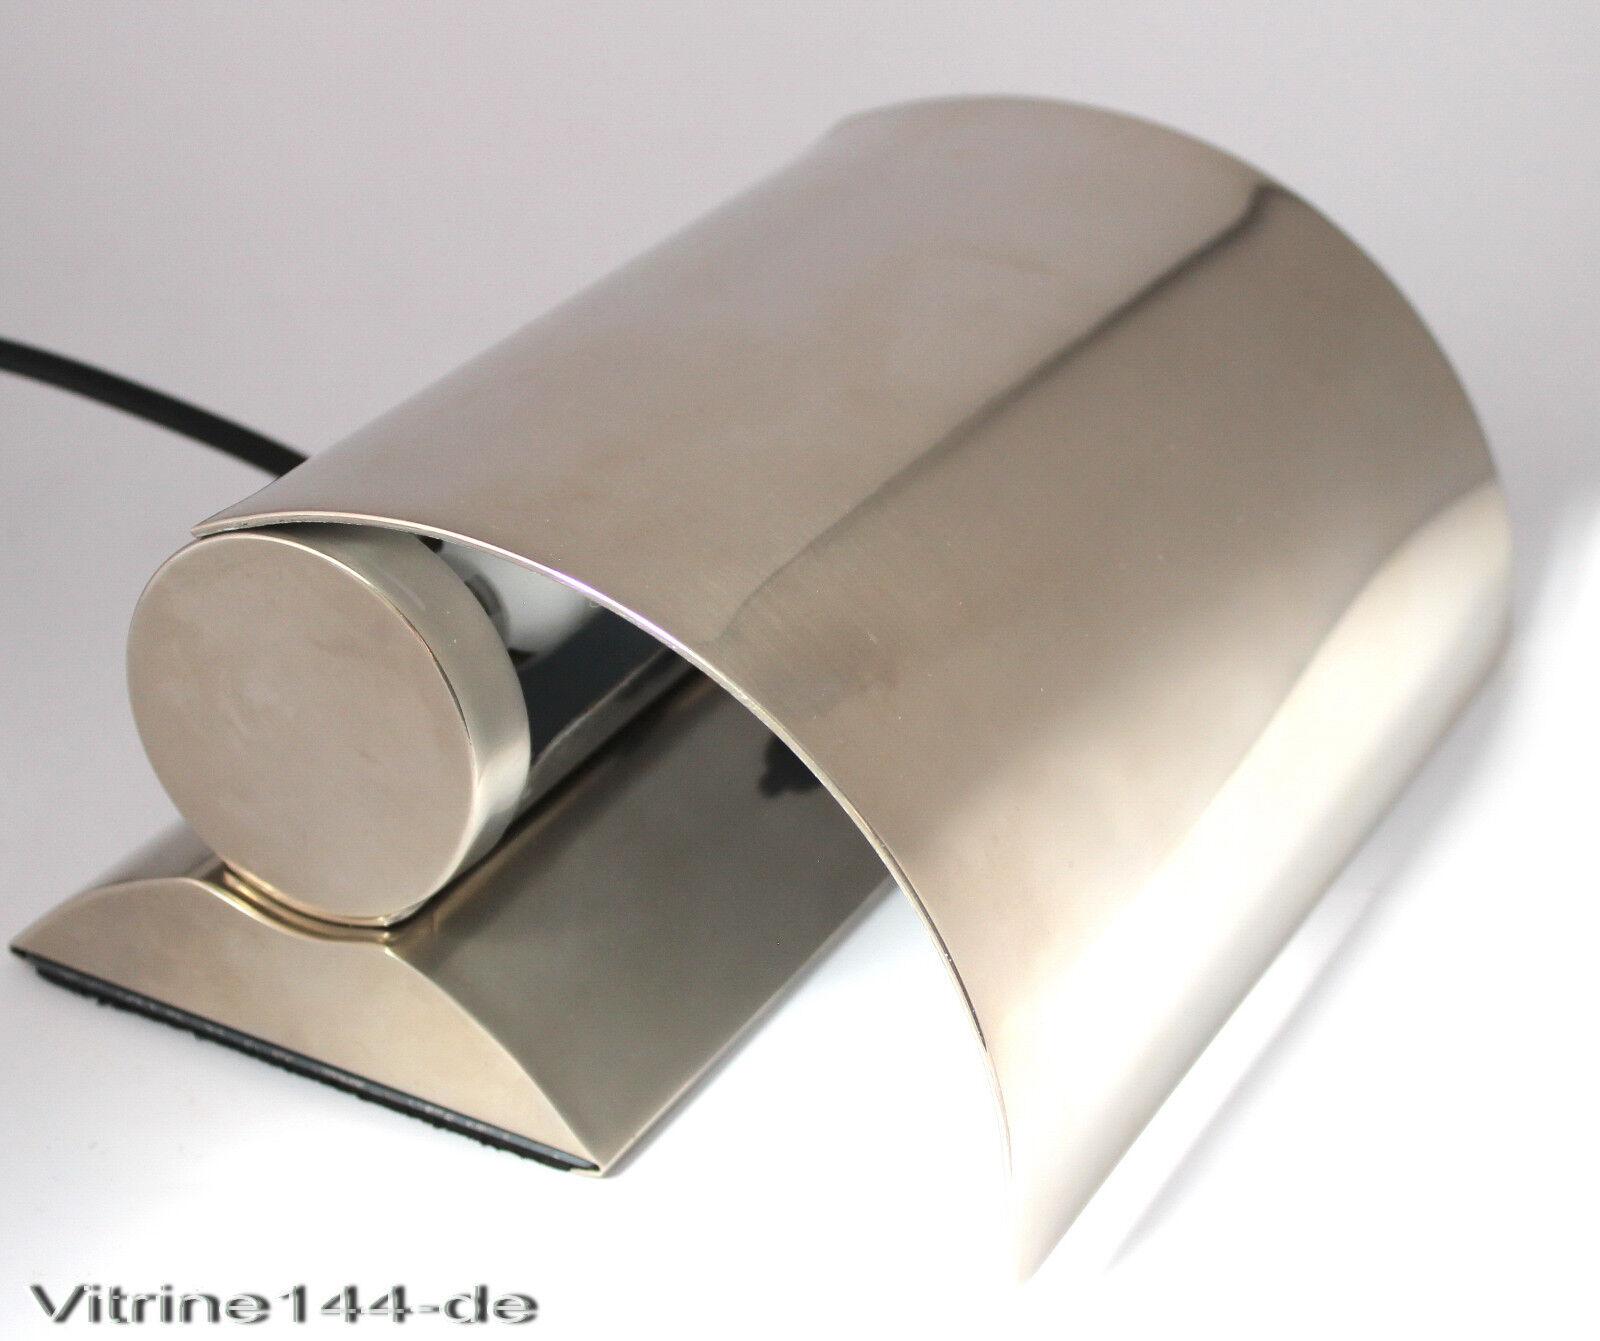 Lampe Silber : bauhaus design lampe tischleuchte wandleuchte silber matt ~ Pilothousefishingboats.com Haus und Dekorationen